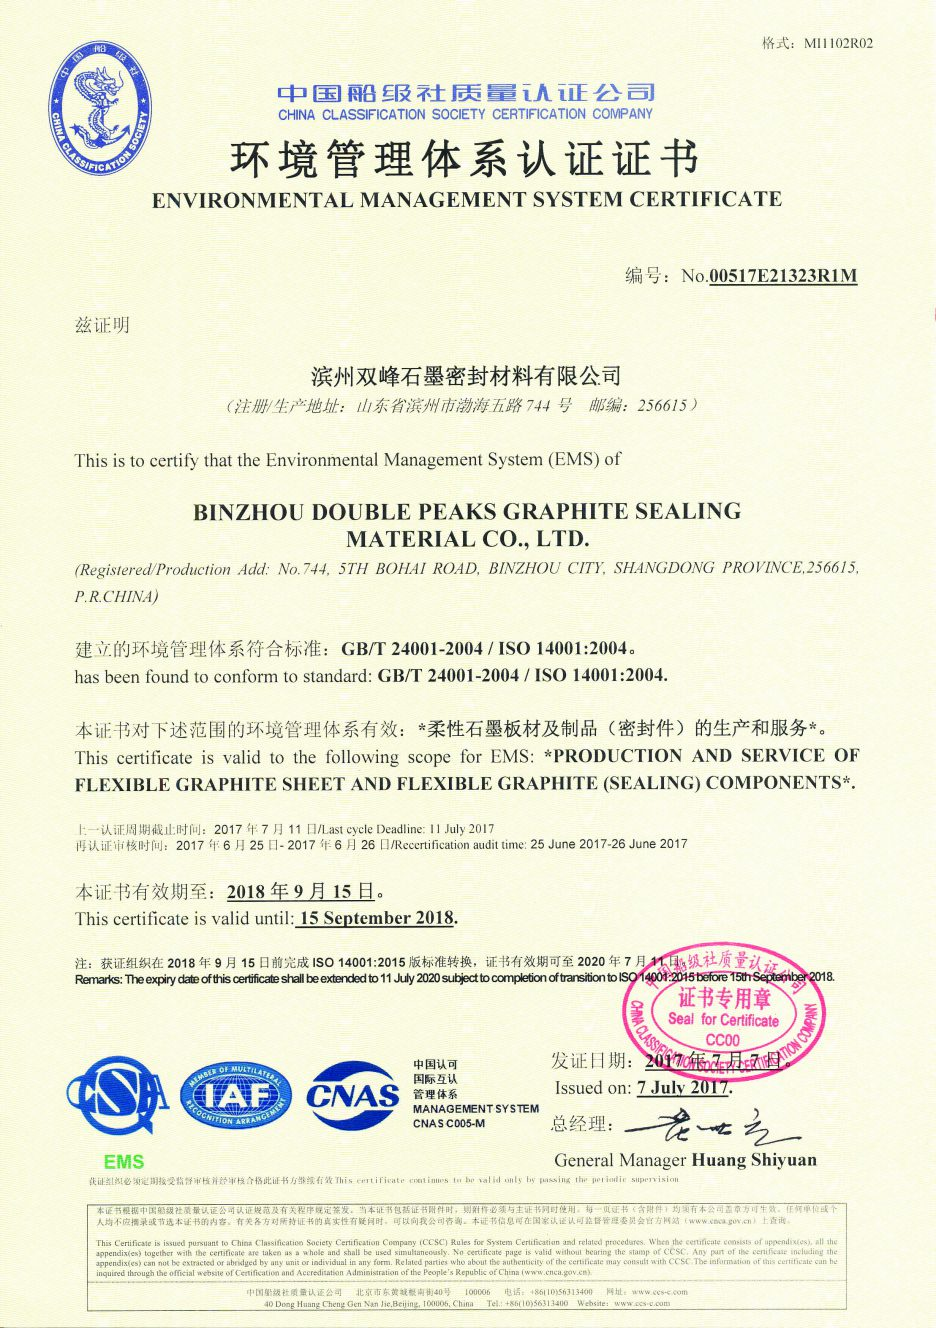 环境管理体系认证证书 Environmental Management System Certificate